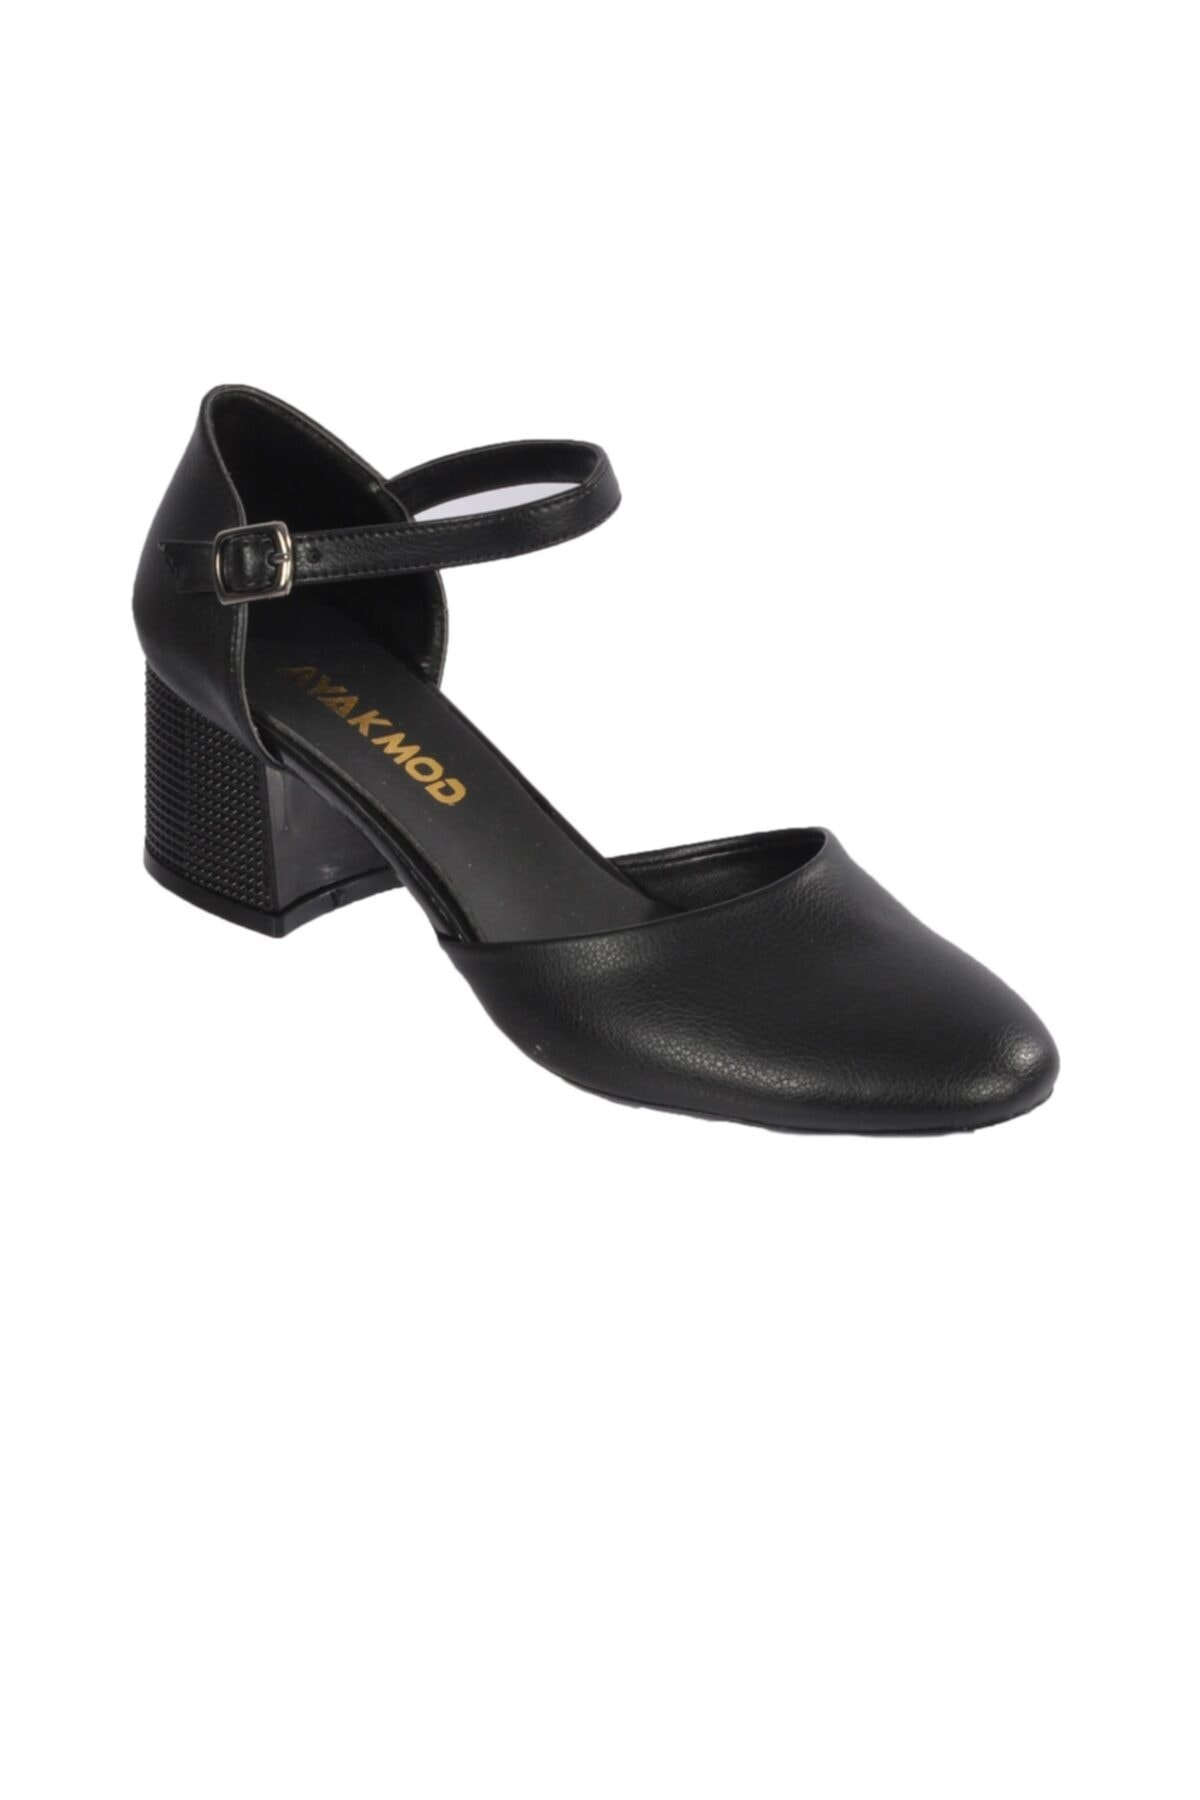 Maje 6031 Siyah Kadın Topuklu Ayakkabı 1